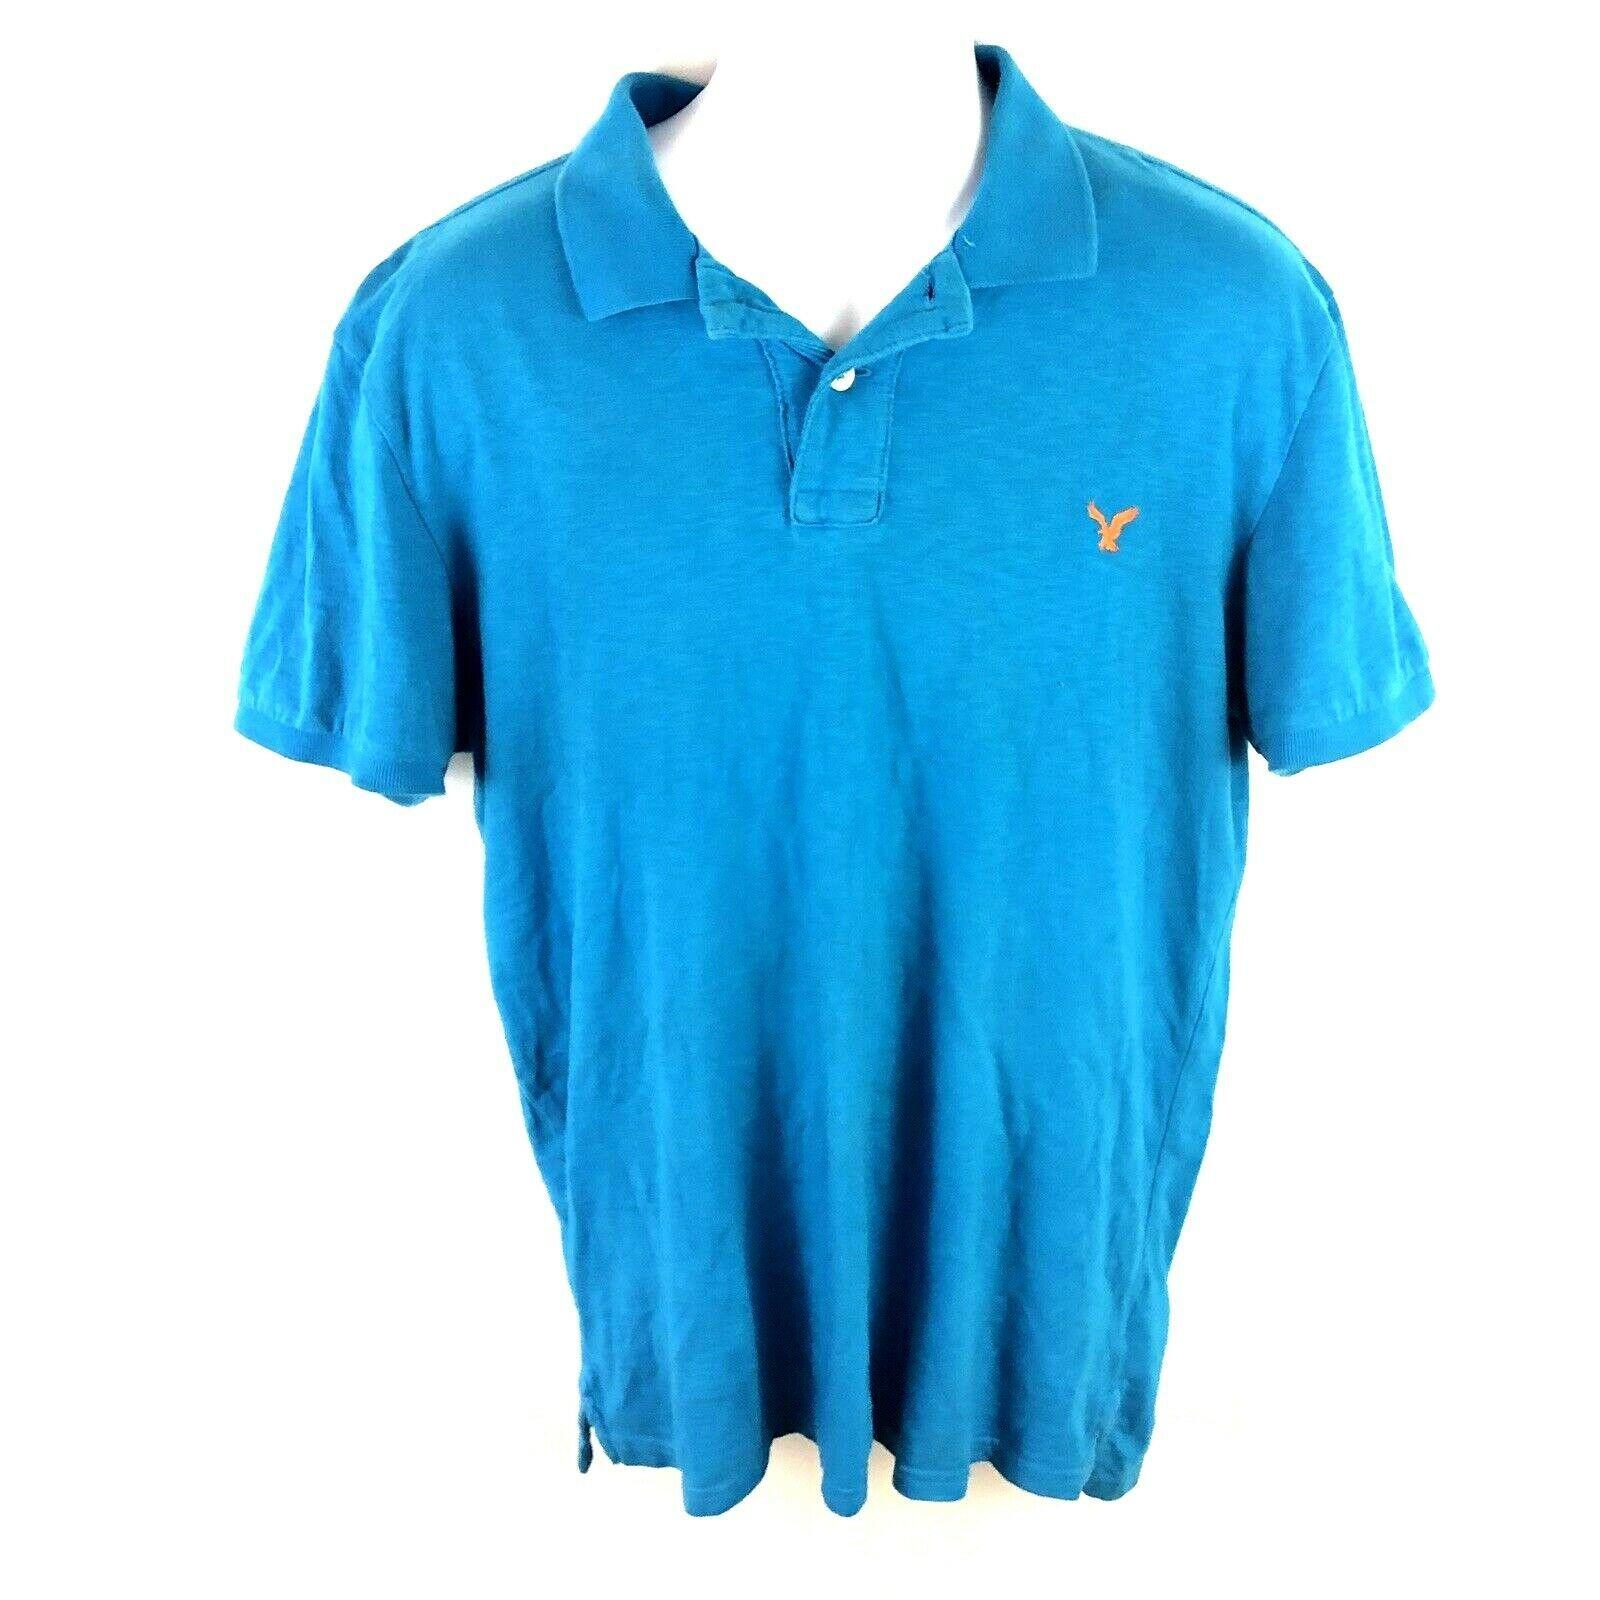 a363e6a8 American Eagle Outfitters Polo Shirt: 33 listings